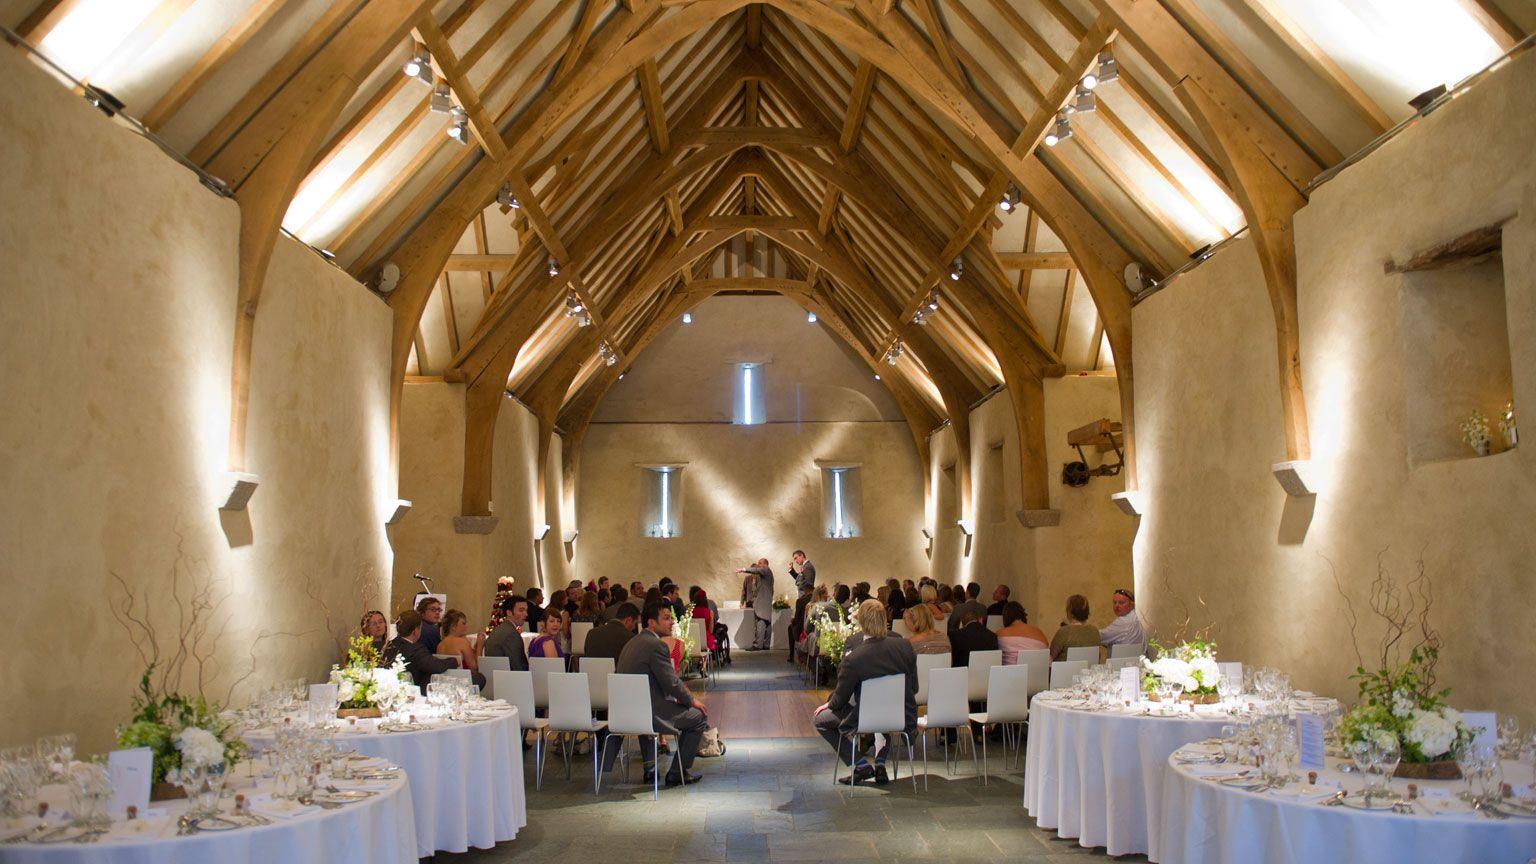 The Great Barn Devon Wedding Venue Wedding Venue Pinterest